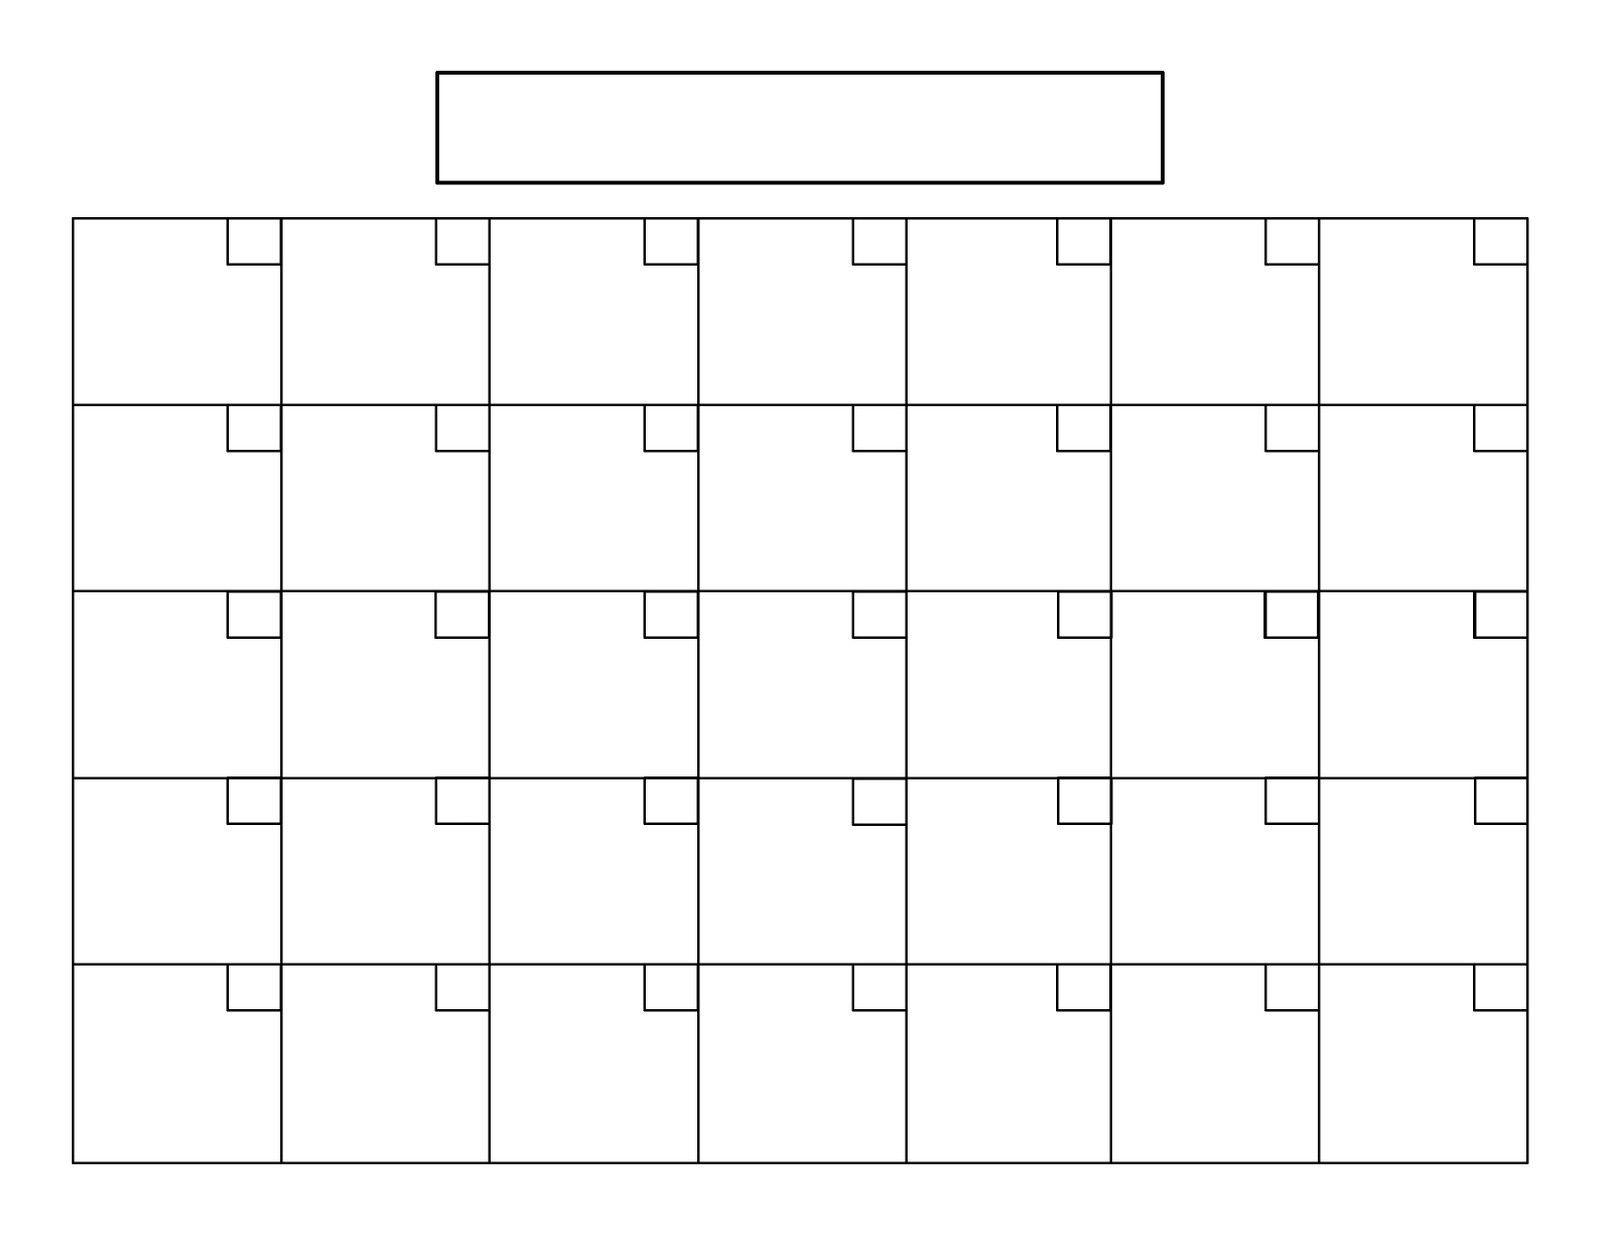 Printable 5 Day Calendar | Wwwww | Printable Blank Calendar